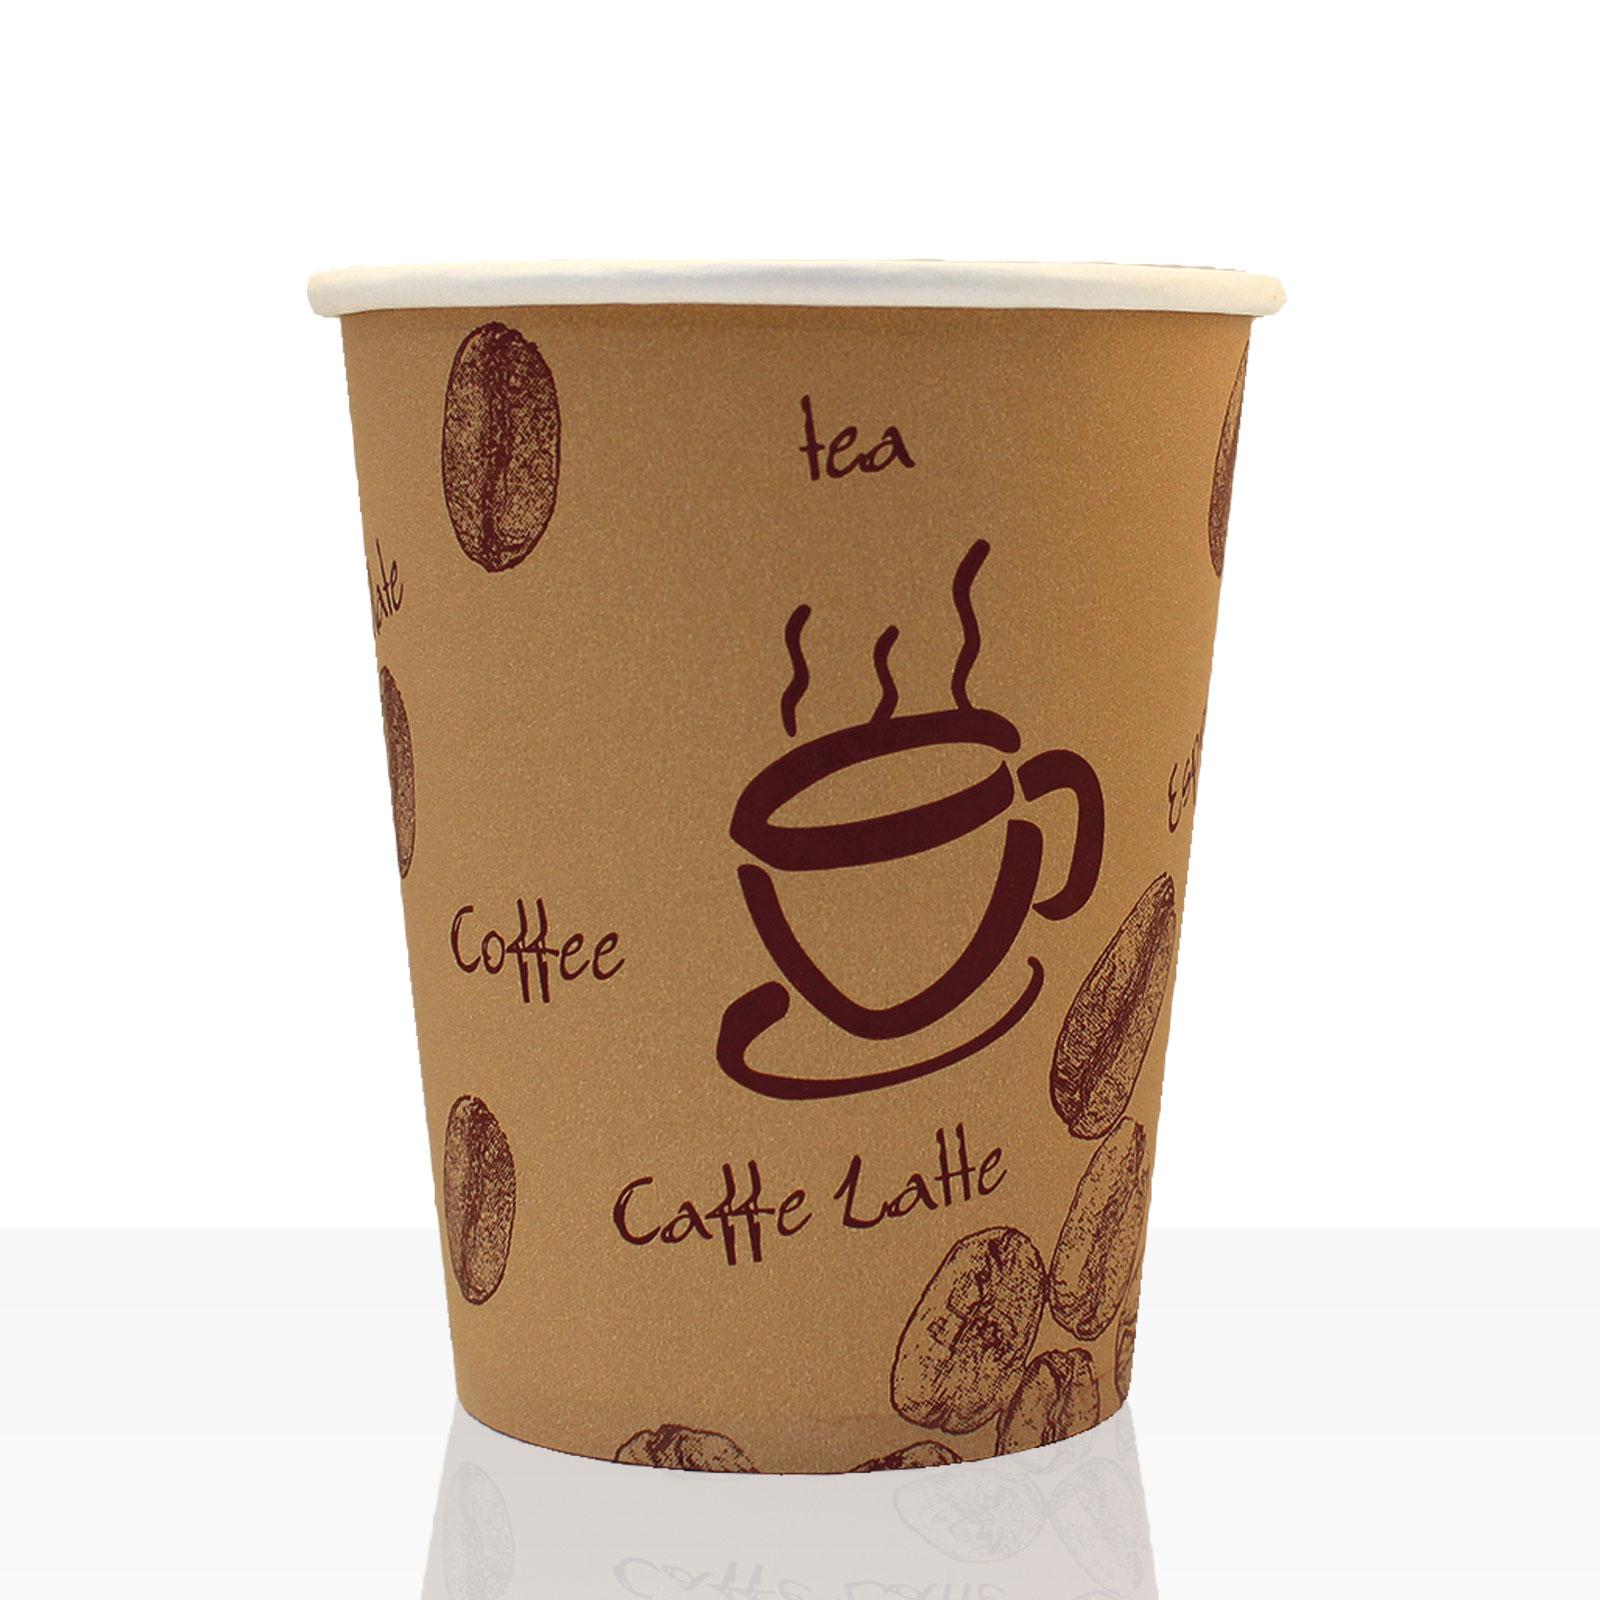 Coffee to go Becher Funny aus Hartpapier 0,3l, 1000Stk, Pappbecher, Kaffeebecher to go